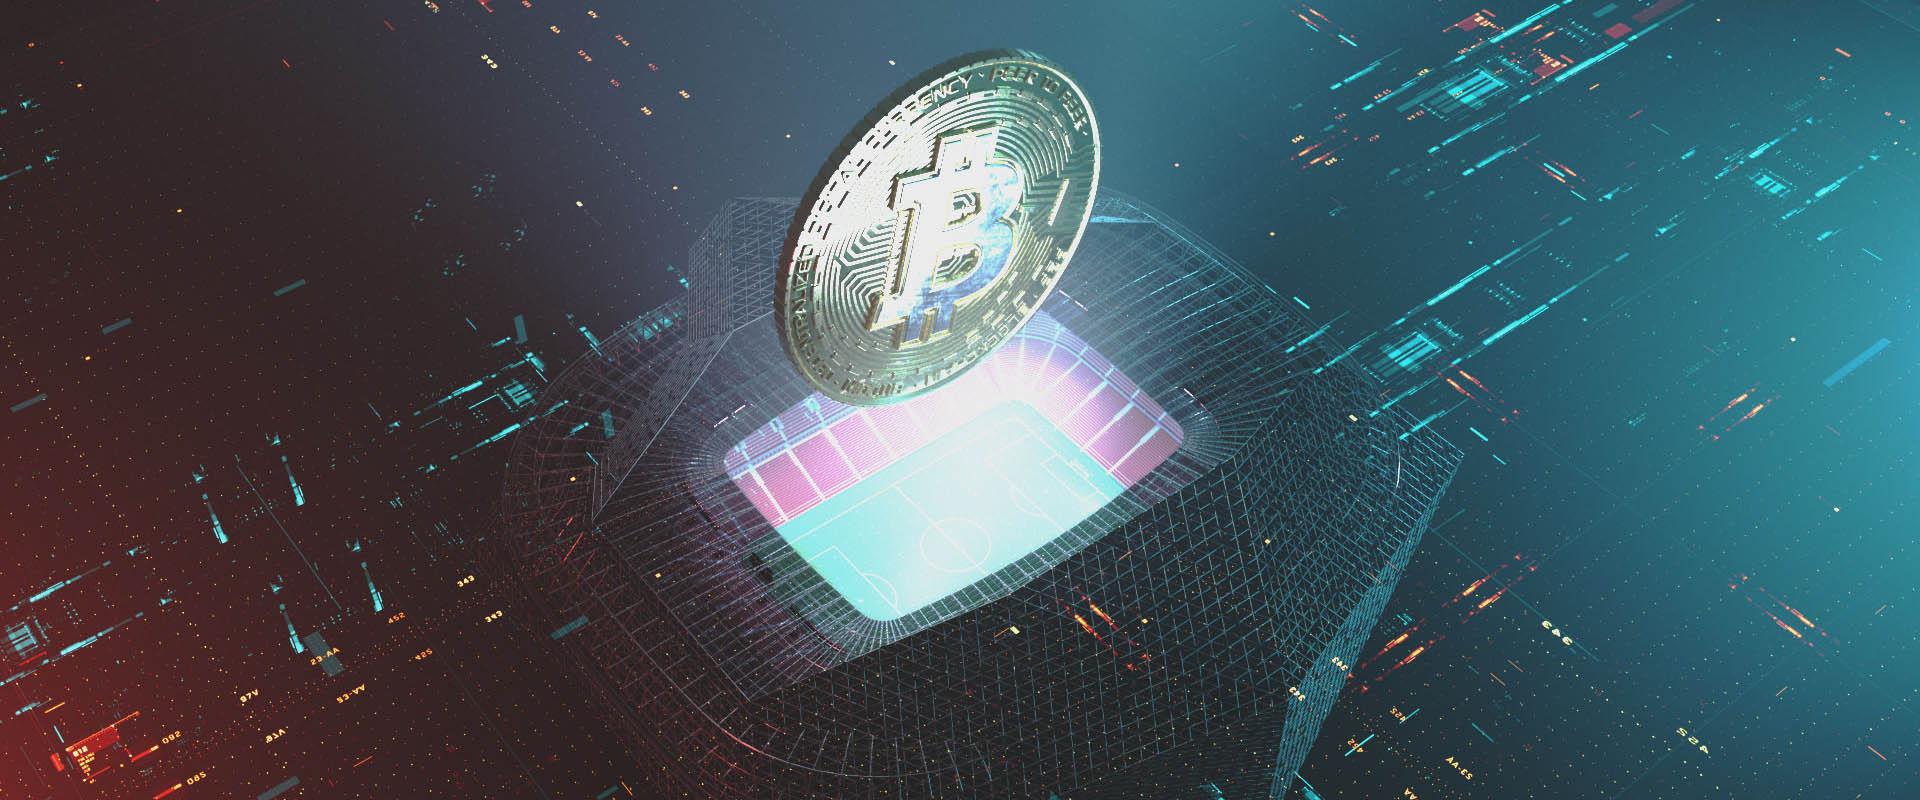 Win A Bitcoin At Euro 2021 With TXMarkets